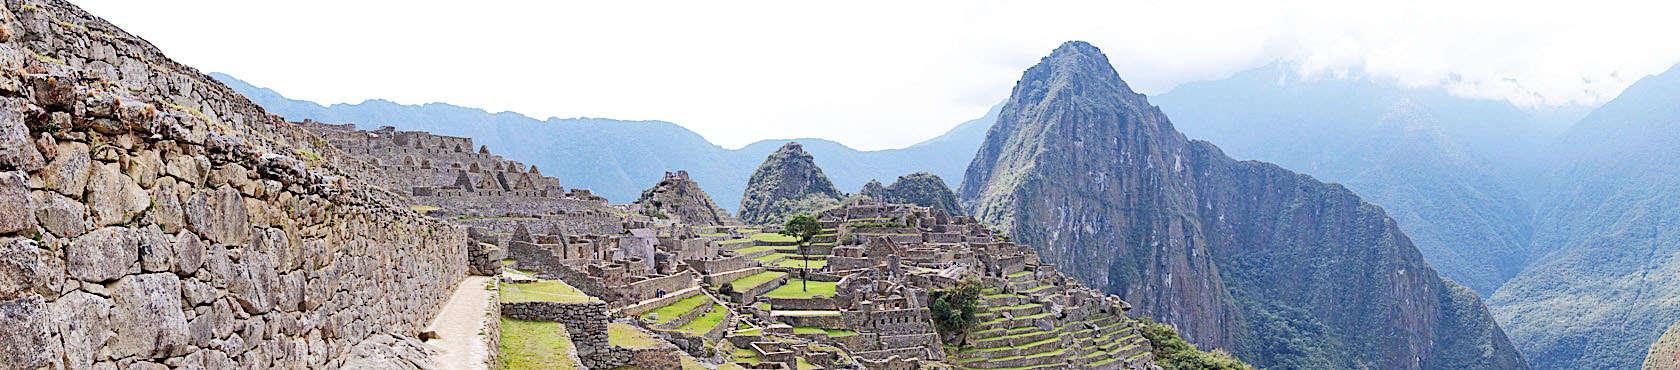 Machu Picchu Panoramaansicht